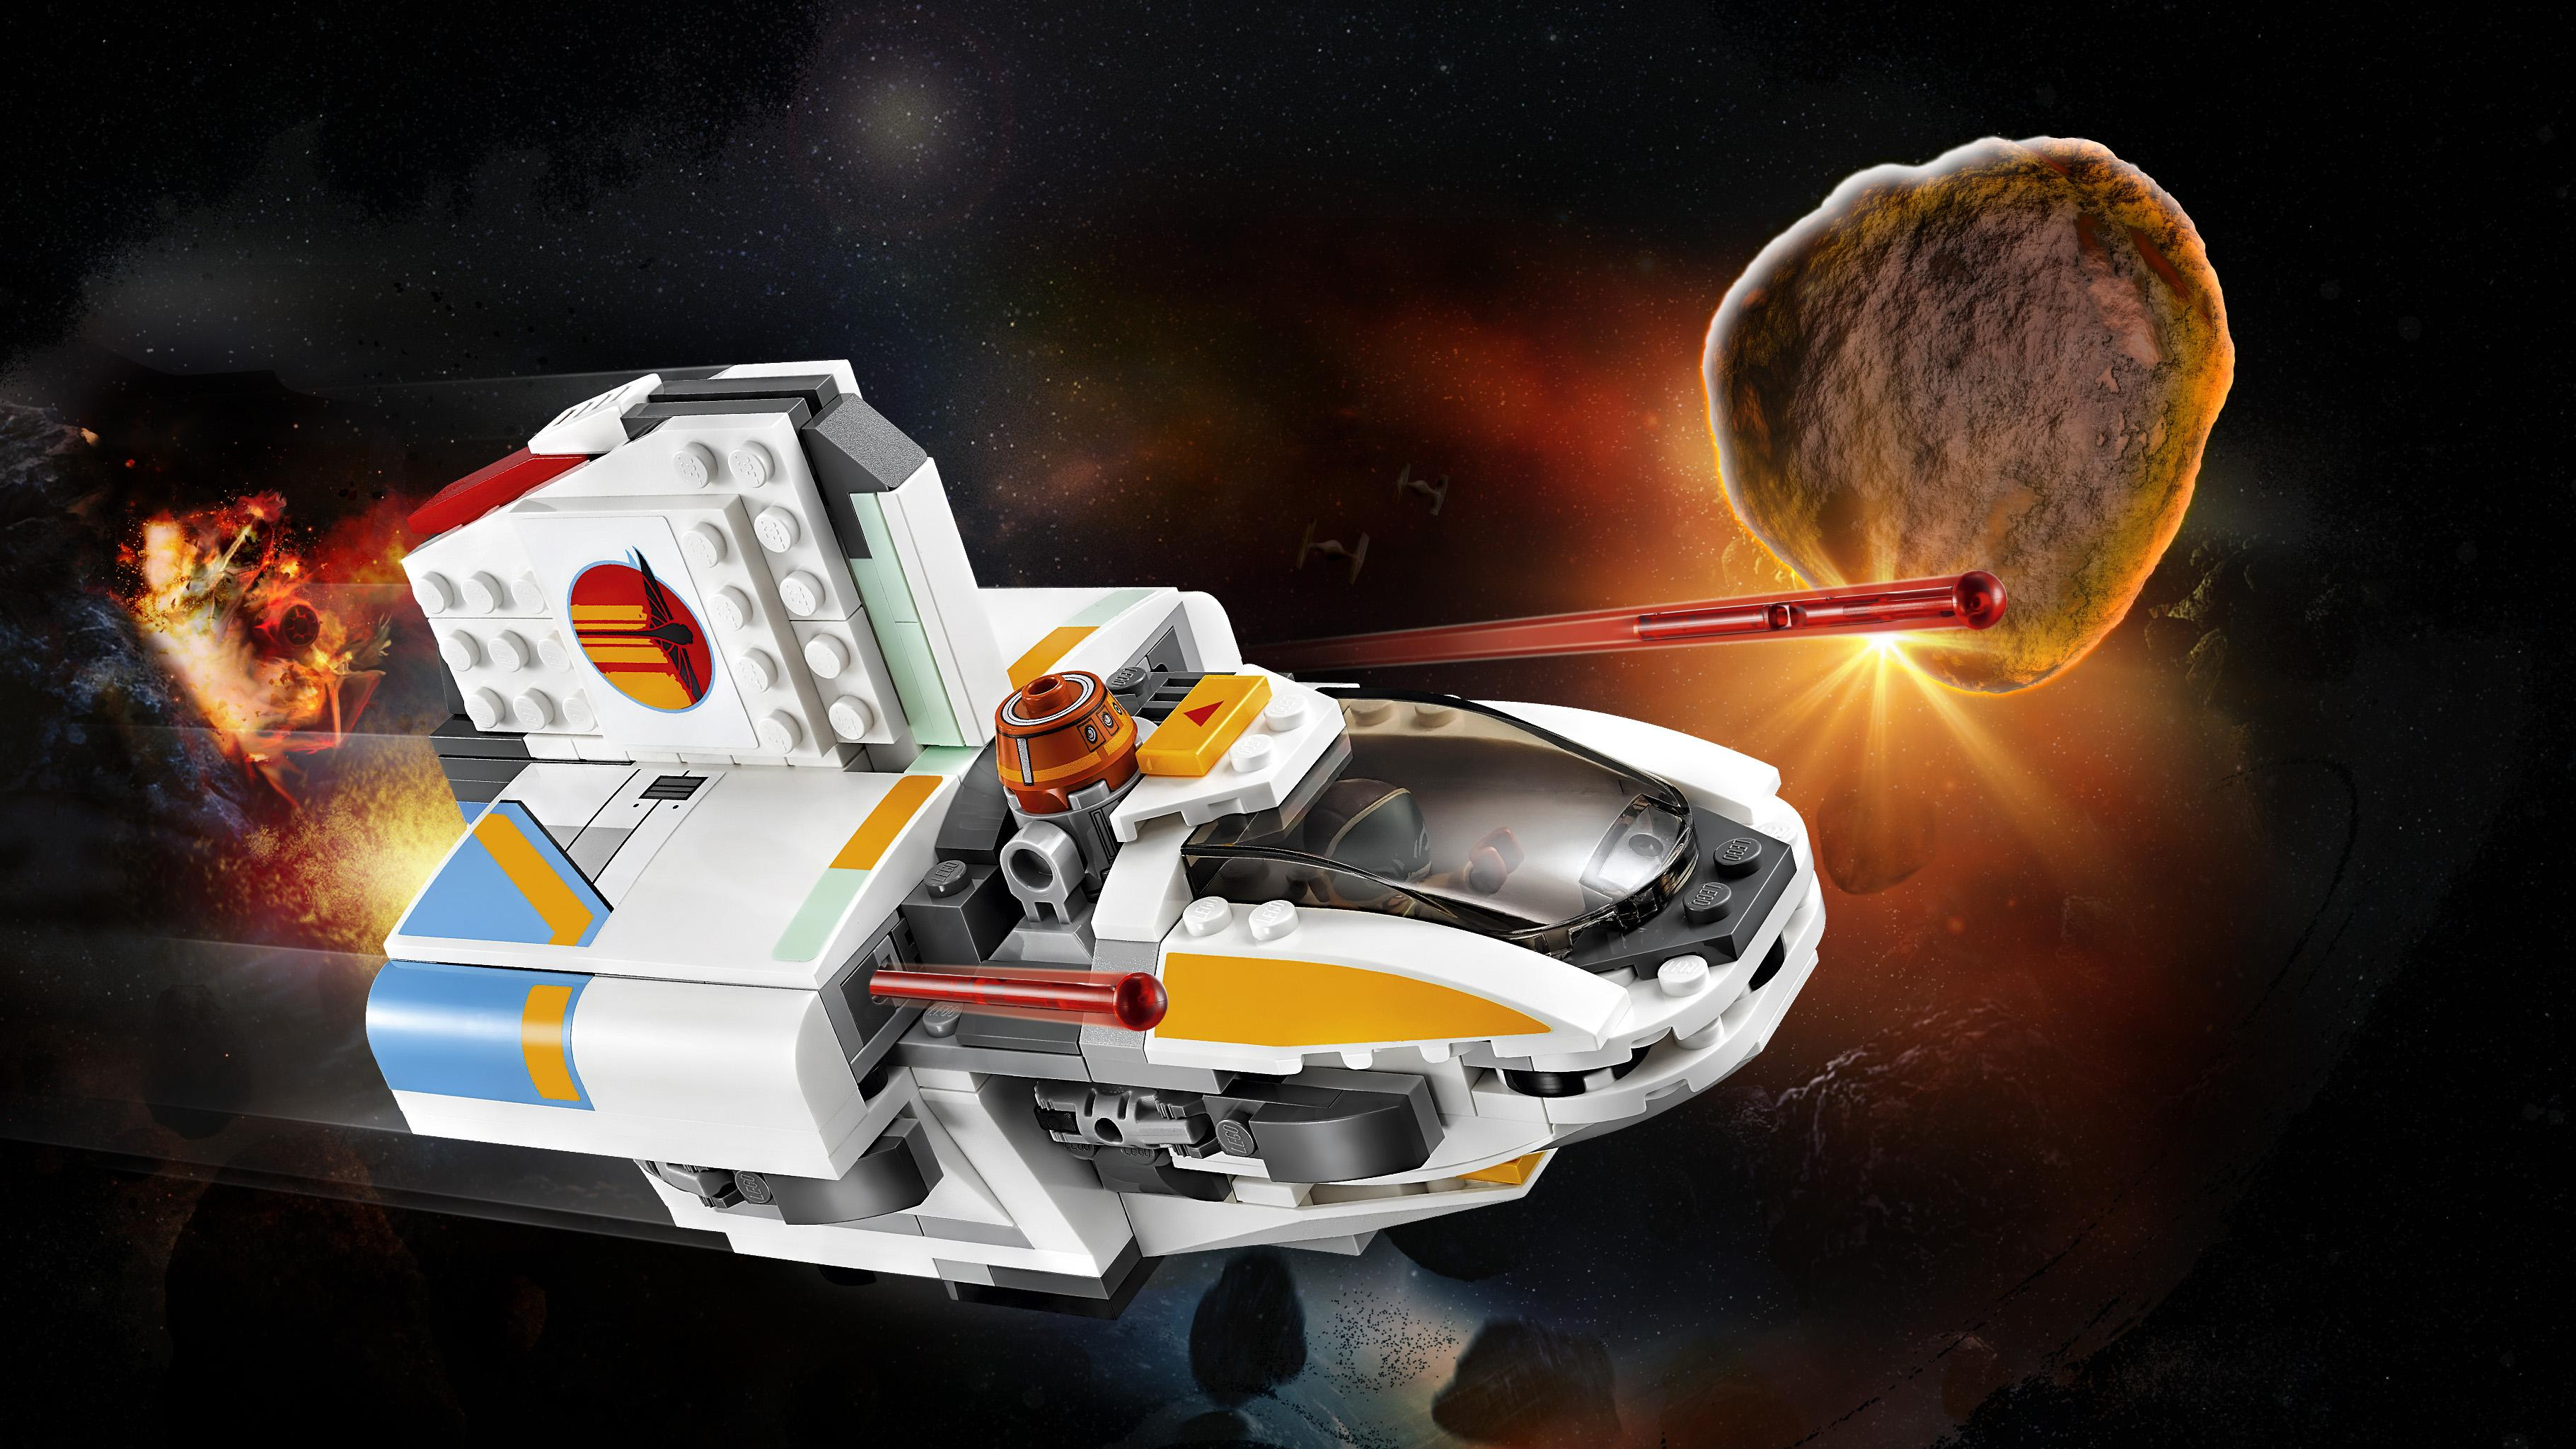 Lego star wars the phantom 75170 building kit - Image star wars lego ...